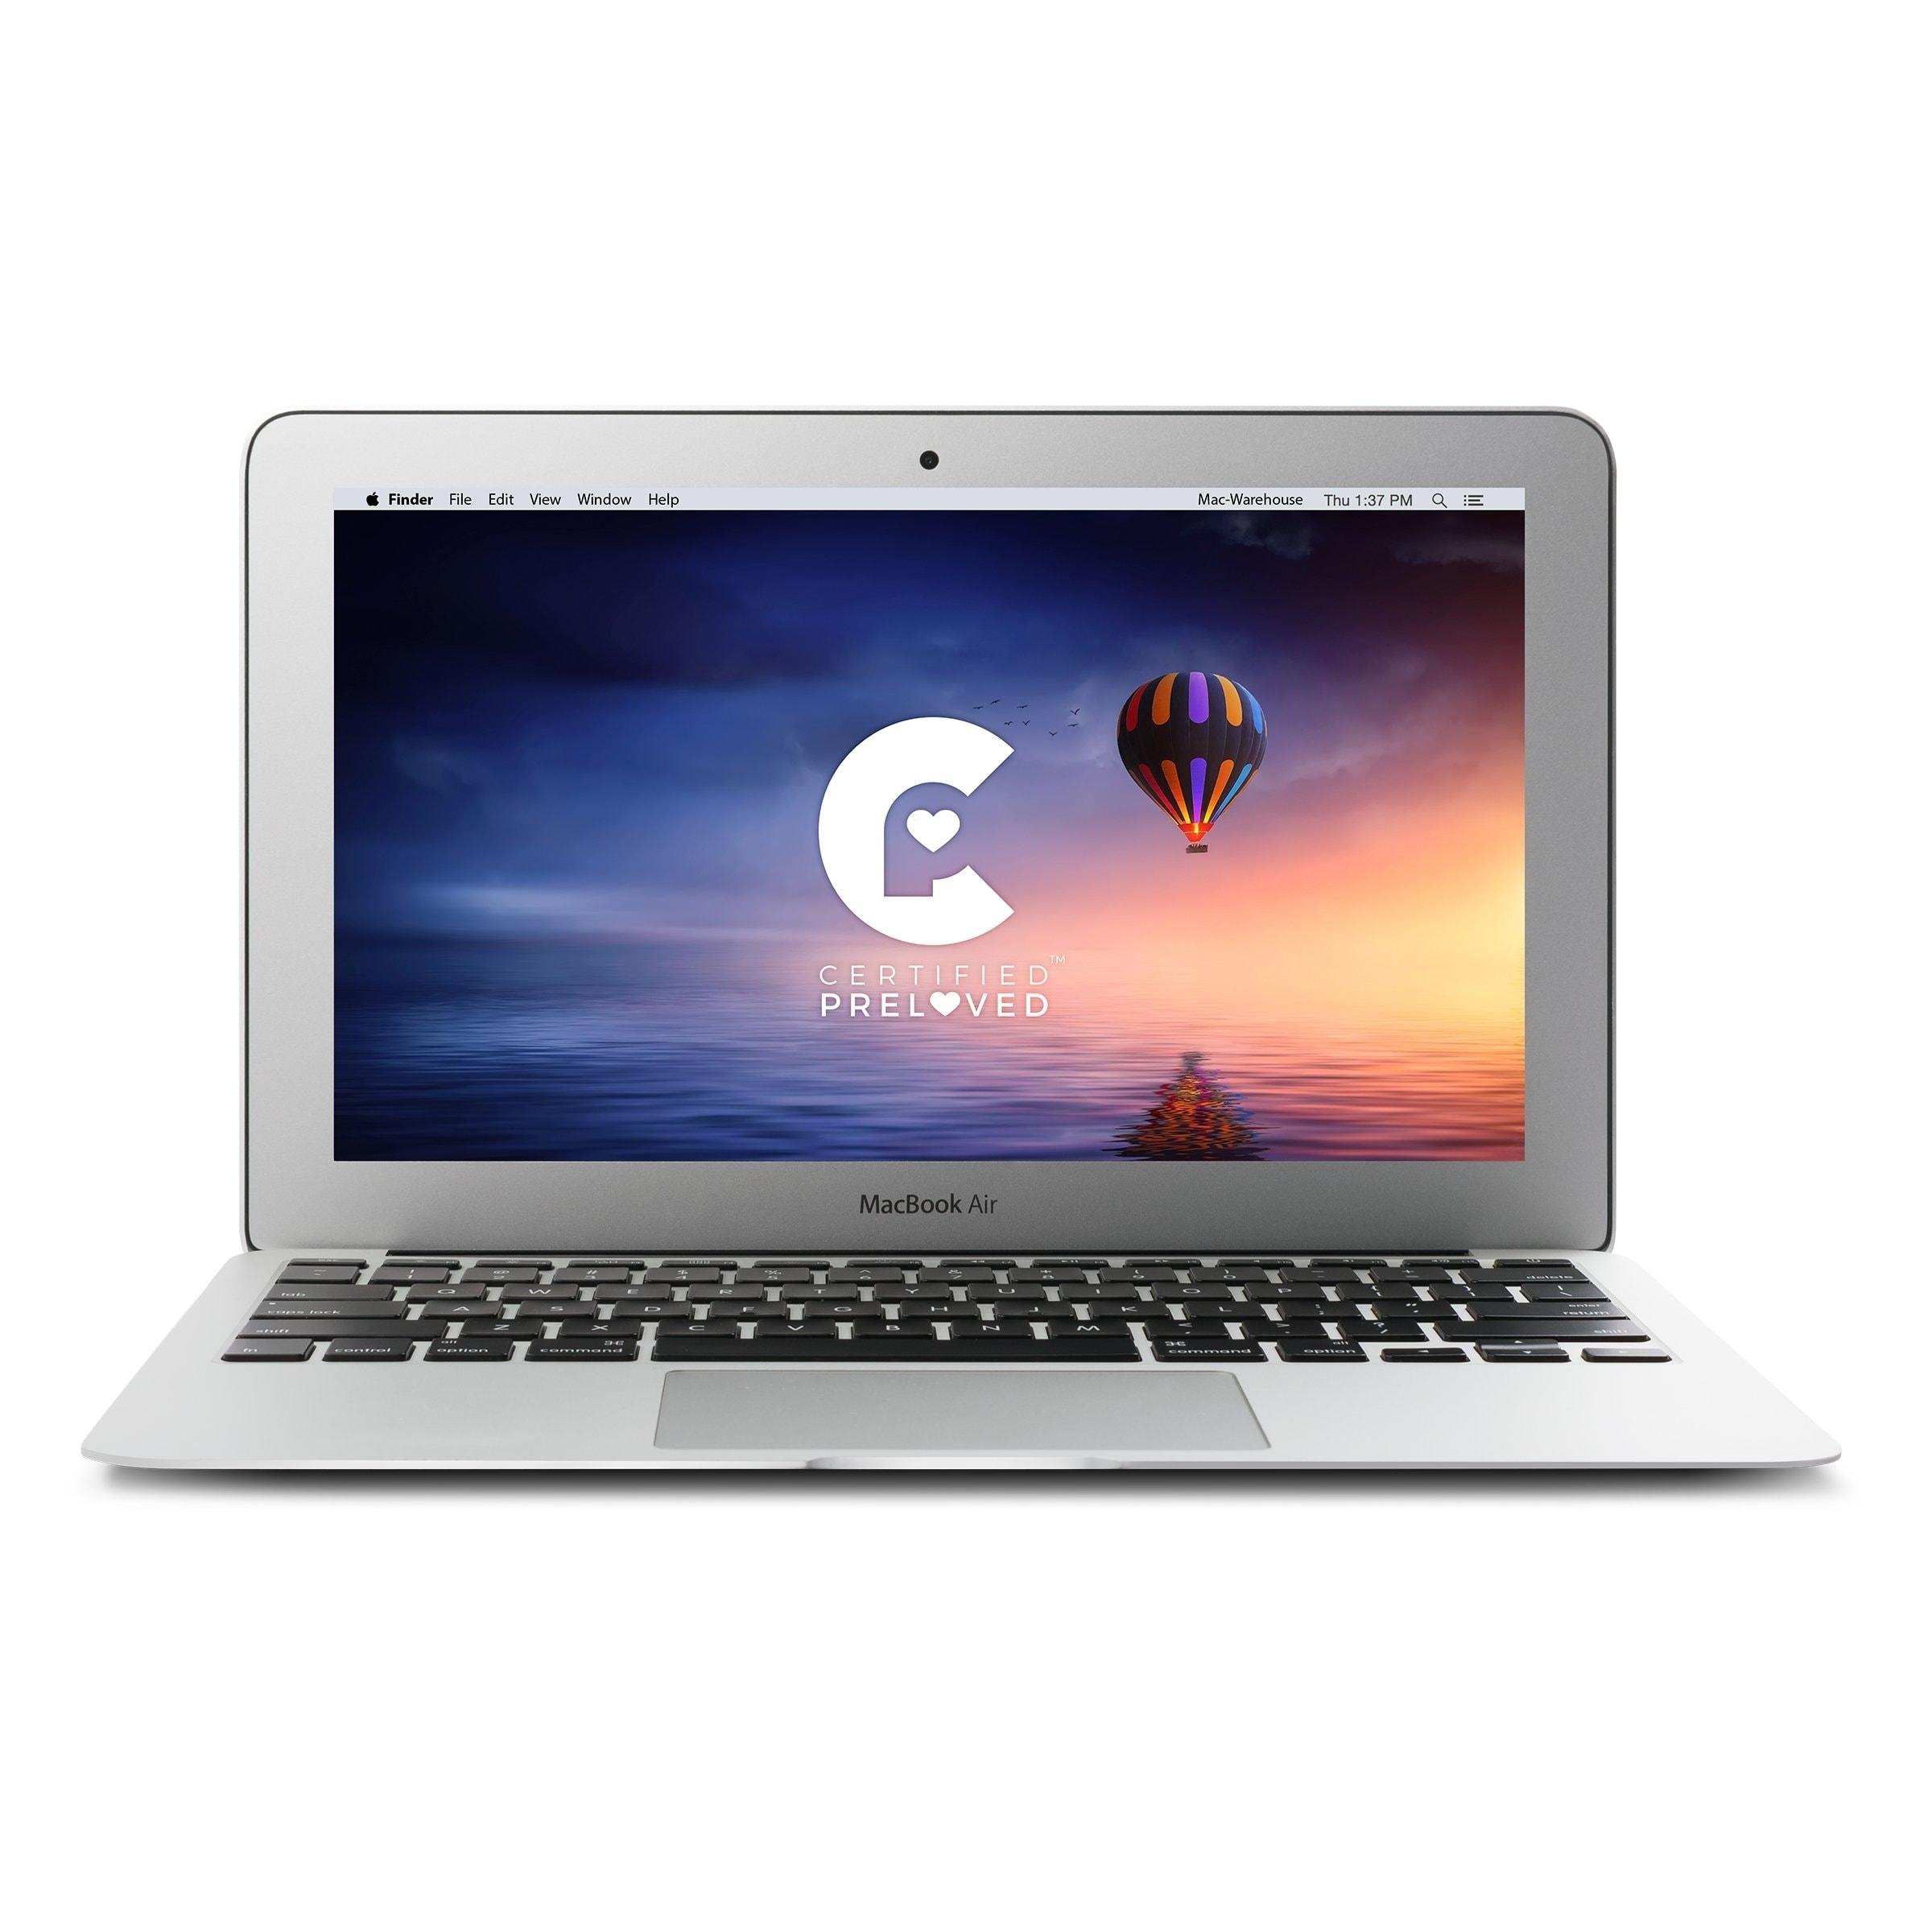 Apple 11.6-inch Macbook Air MD224LL/A DCi5 1.7 GHz 4GB RAM 128GB SSD - Refurbished by Overstock 128gb flash - 4 GB